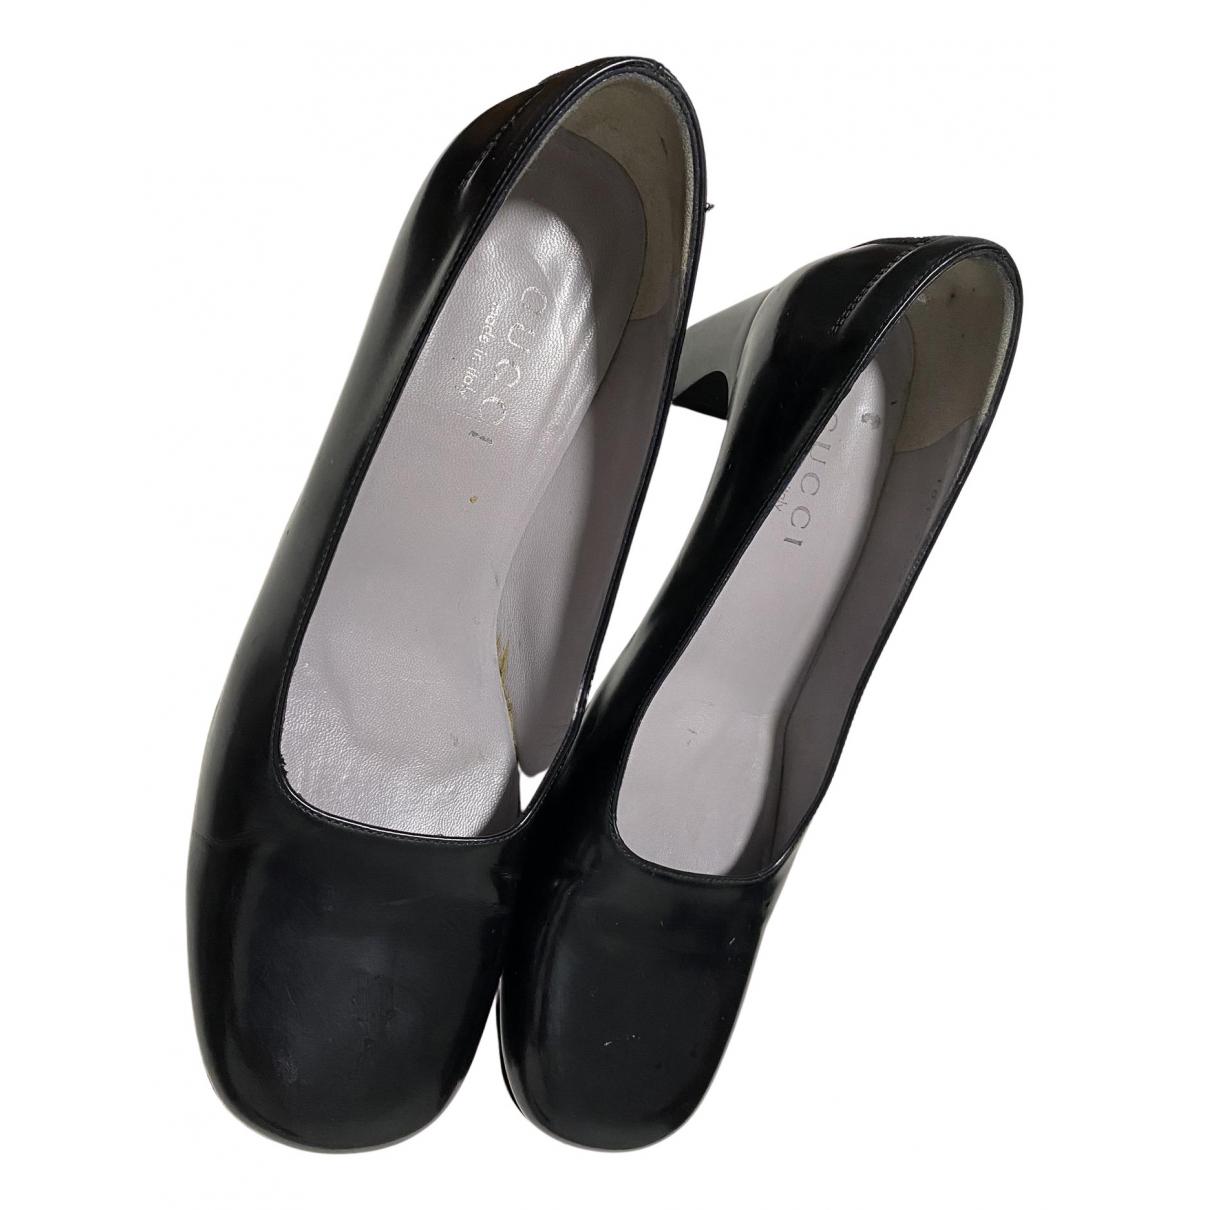 Gucci N Black Leather Heels for Women 37.5 EU